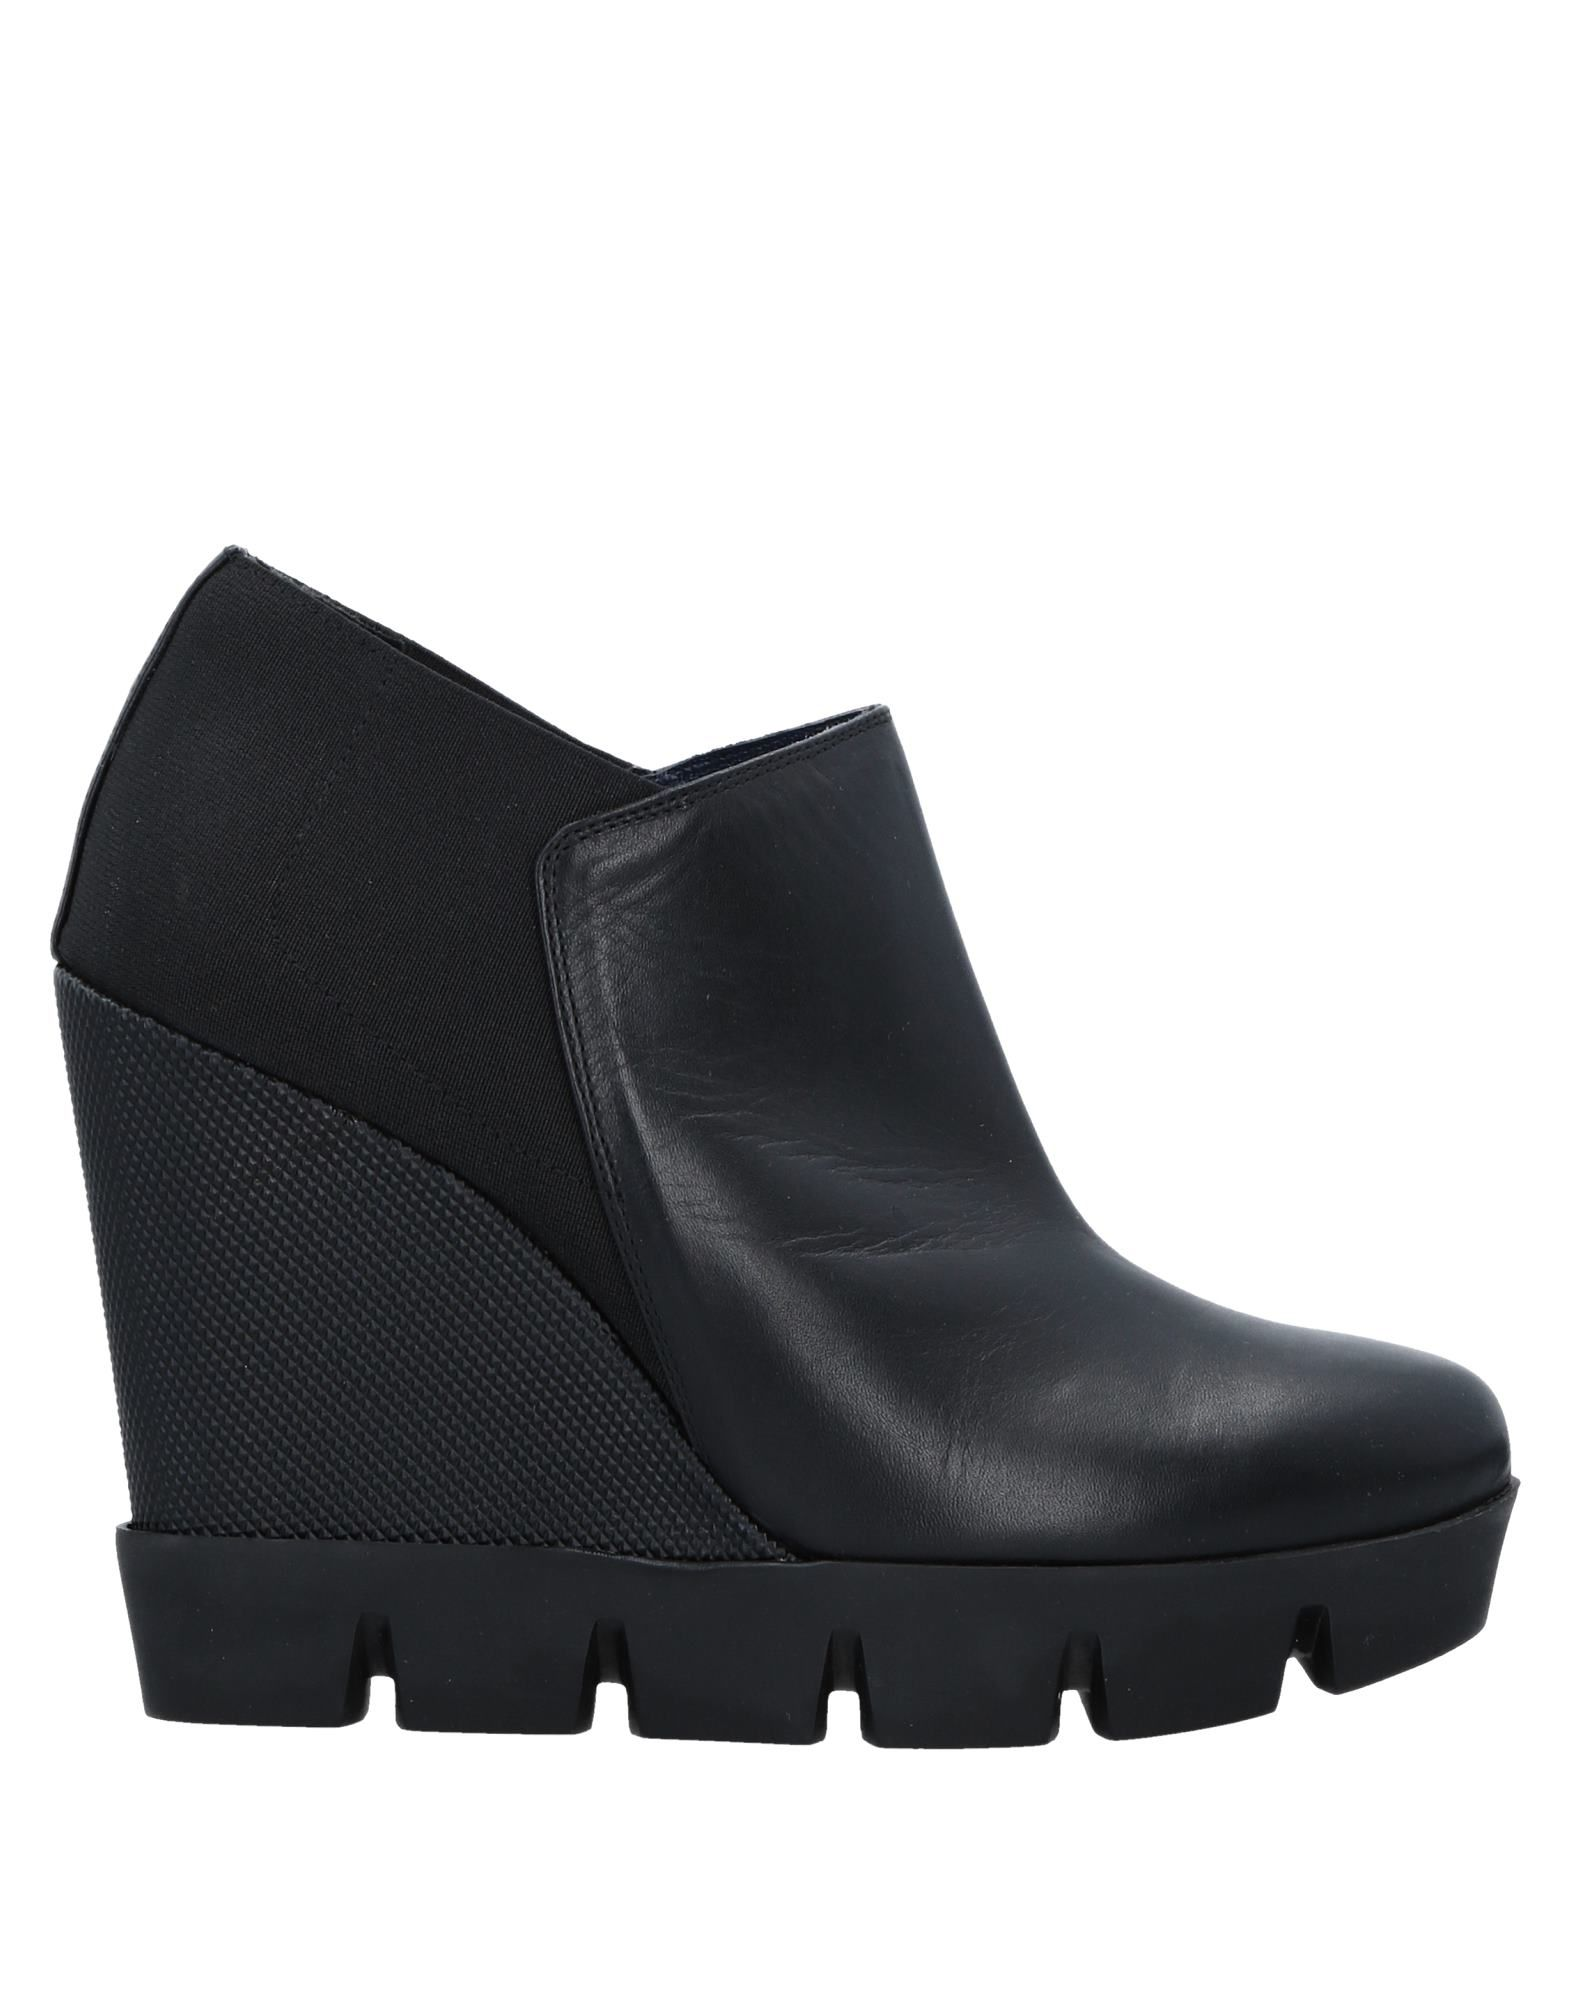 Studio Pollini Stiefelette Damen  11529336IKGut aussehende strapazierfähige Schuhe